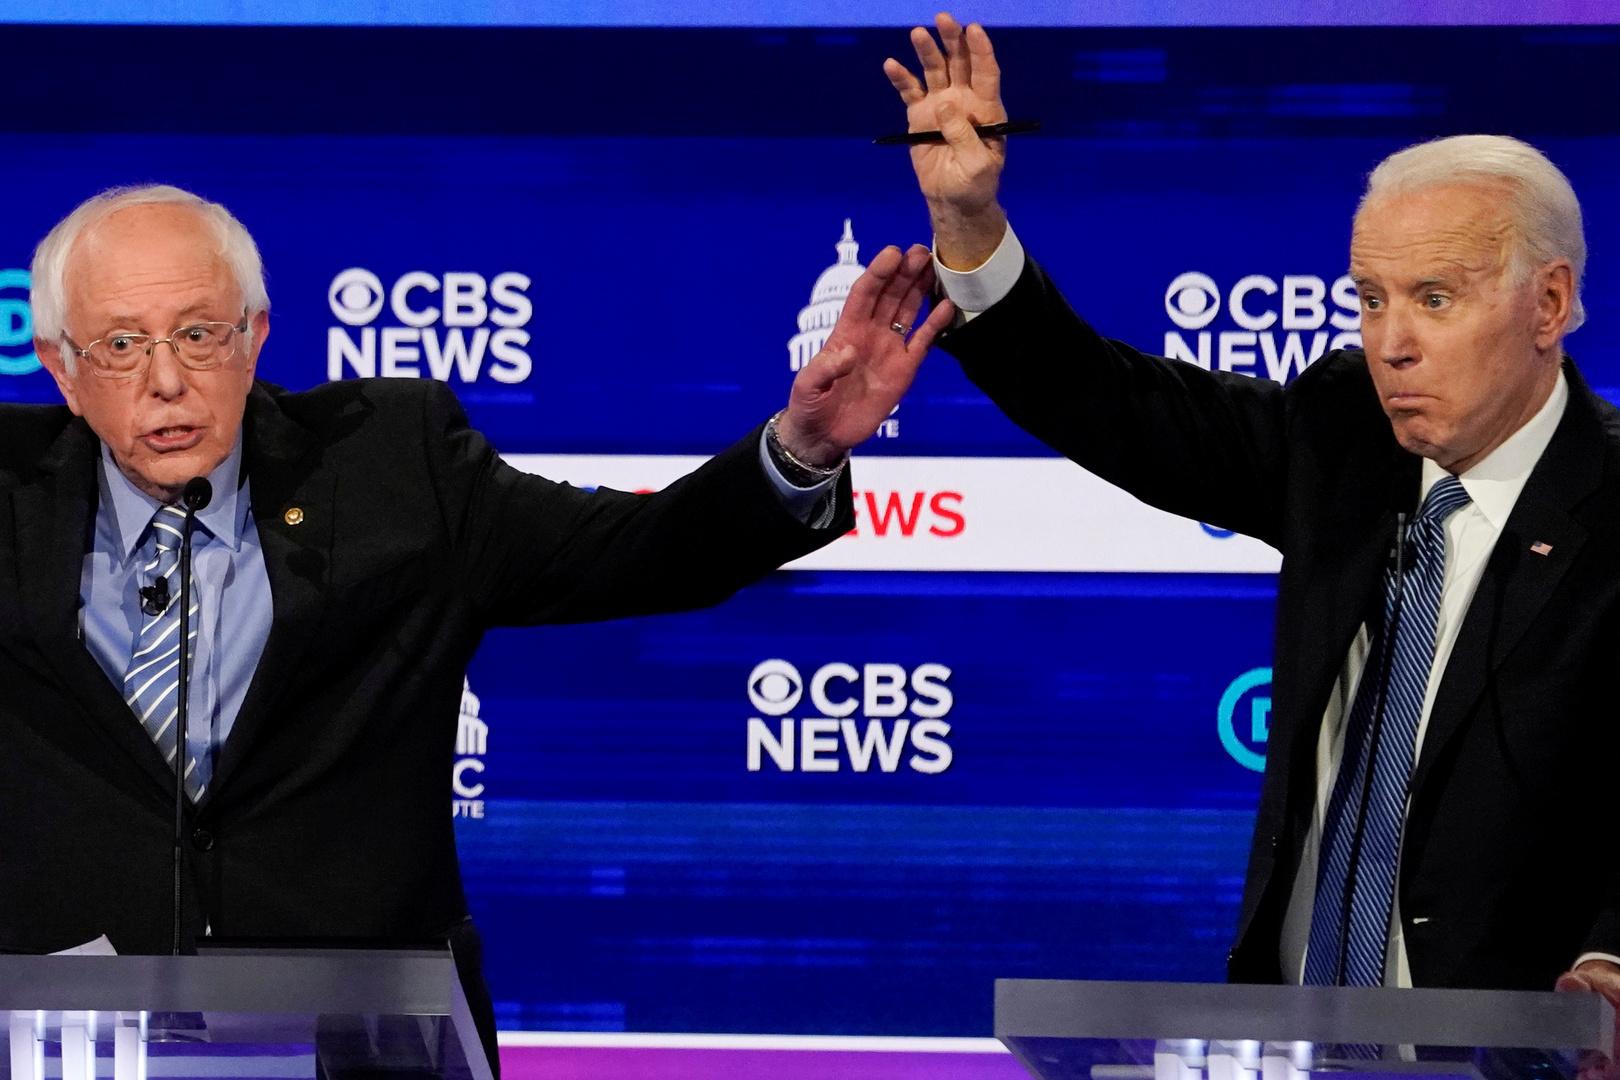 نائب الرئيس الأمريكي السابق، جو بايدن، والسيناتور بيرني ساندرز